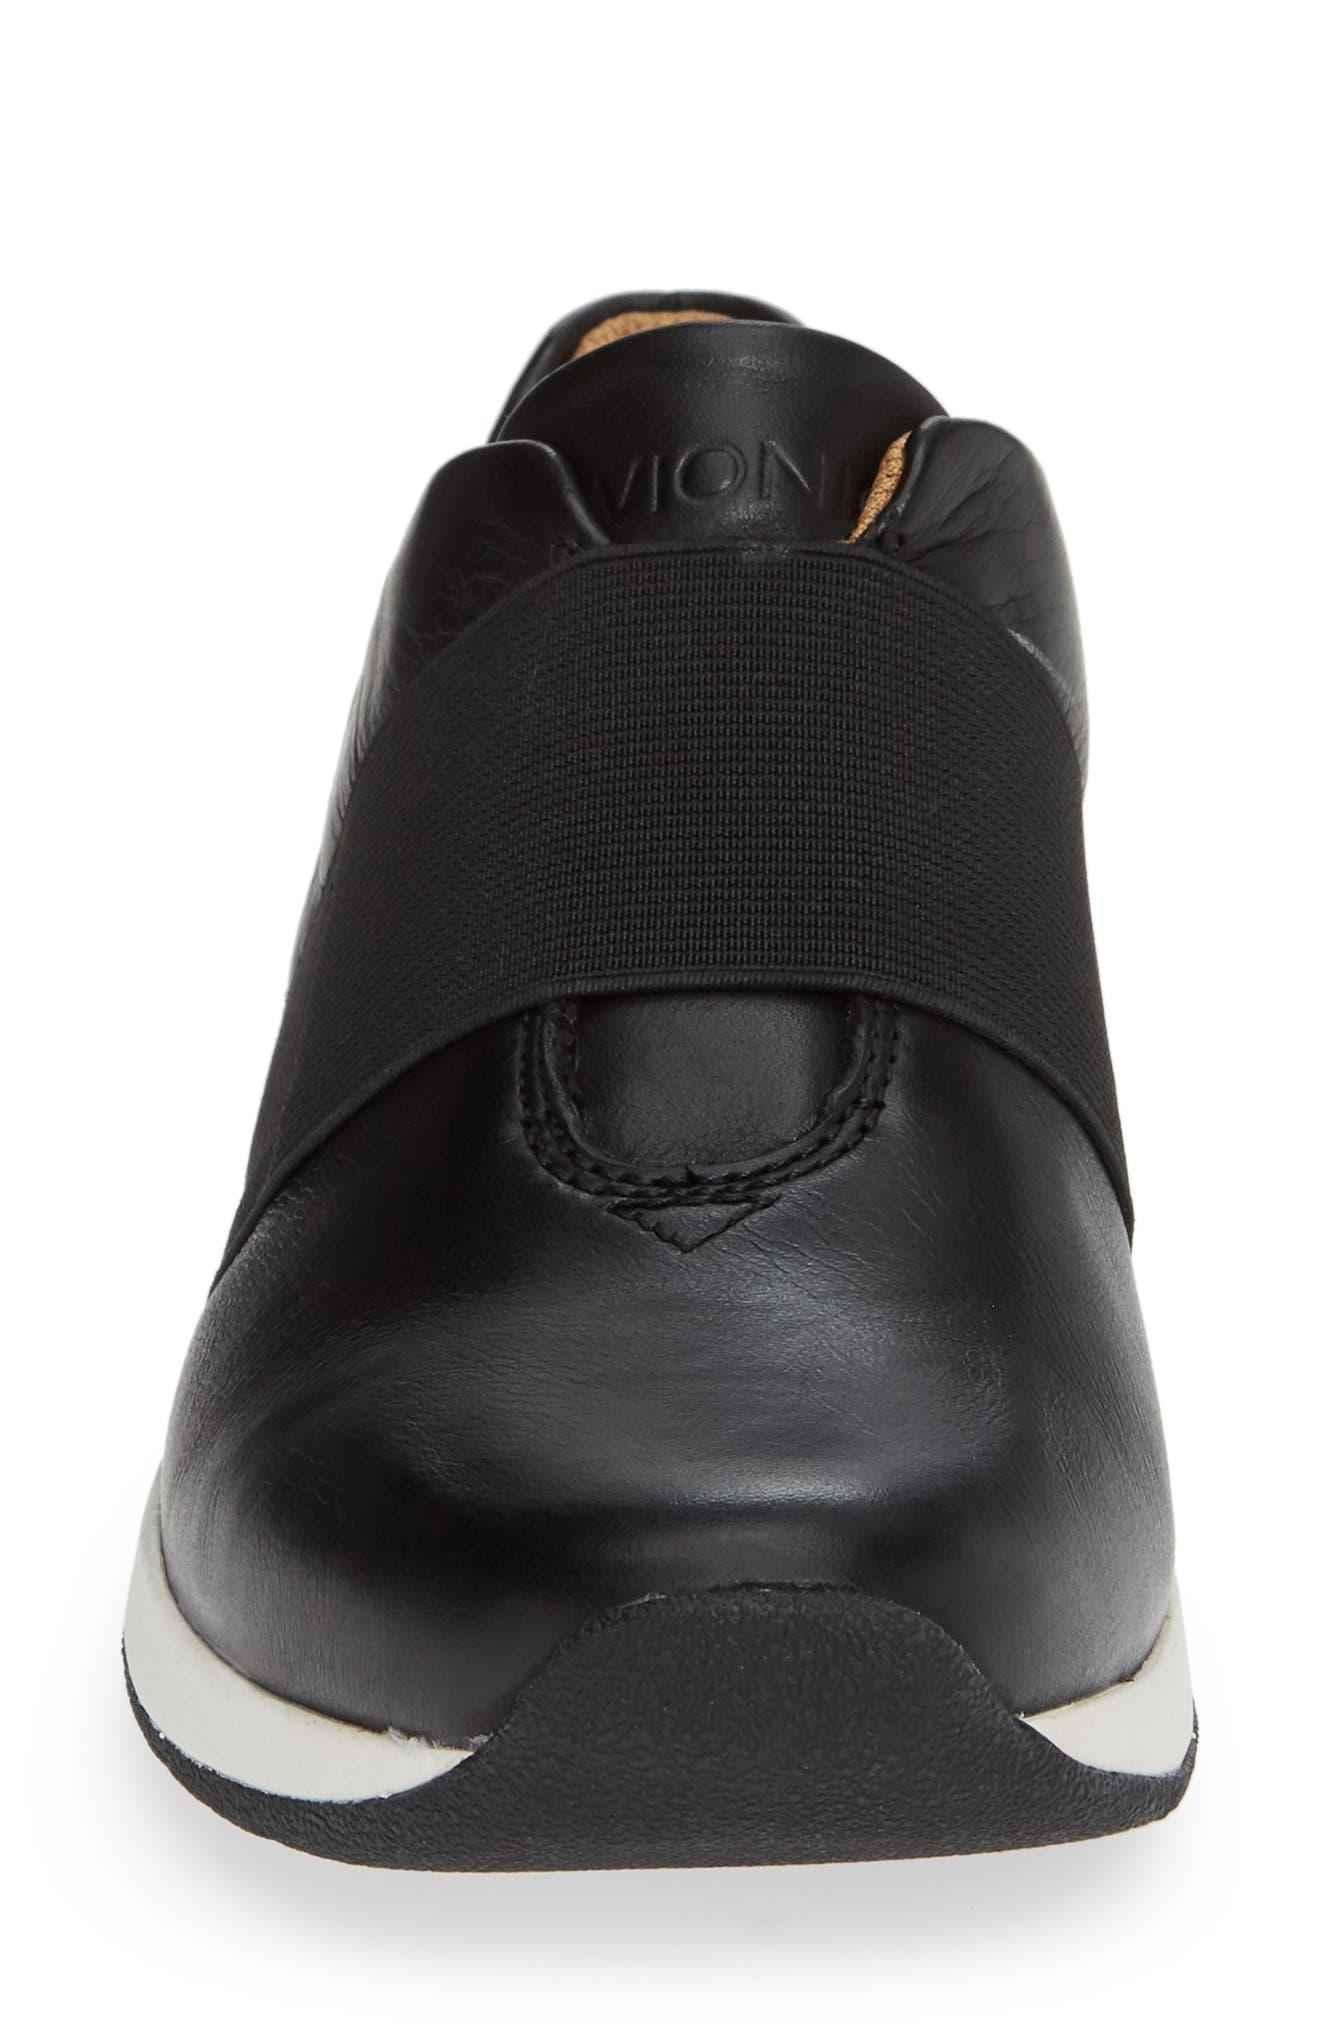 Codie Slip-On Sneaker,                             Alternate thumbnail 4, color,                             BLACK LEATHER